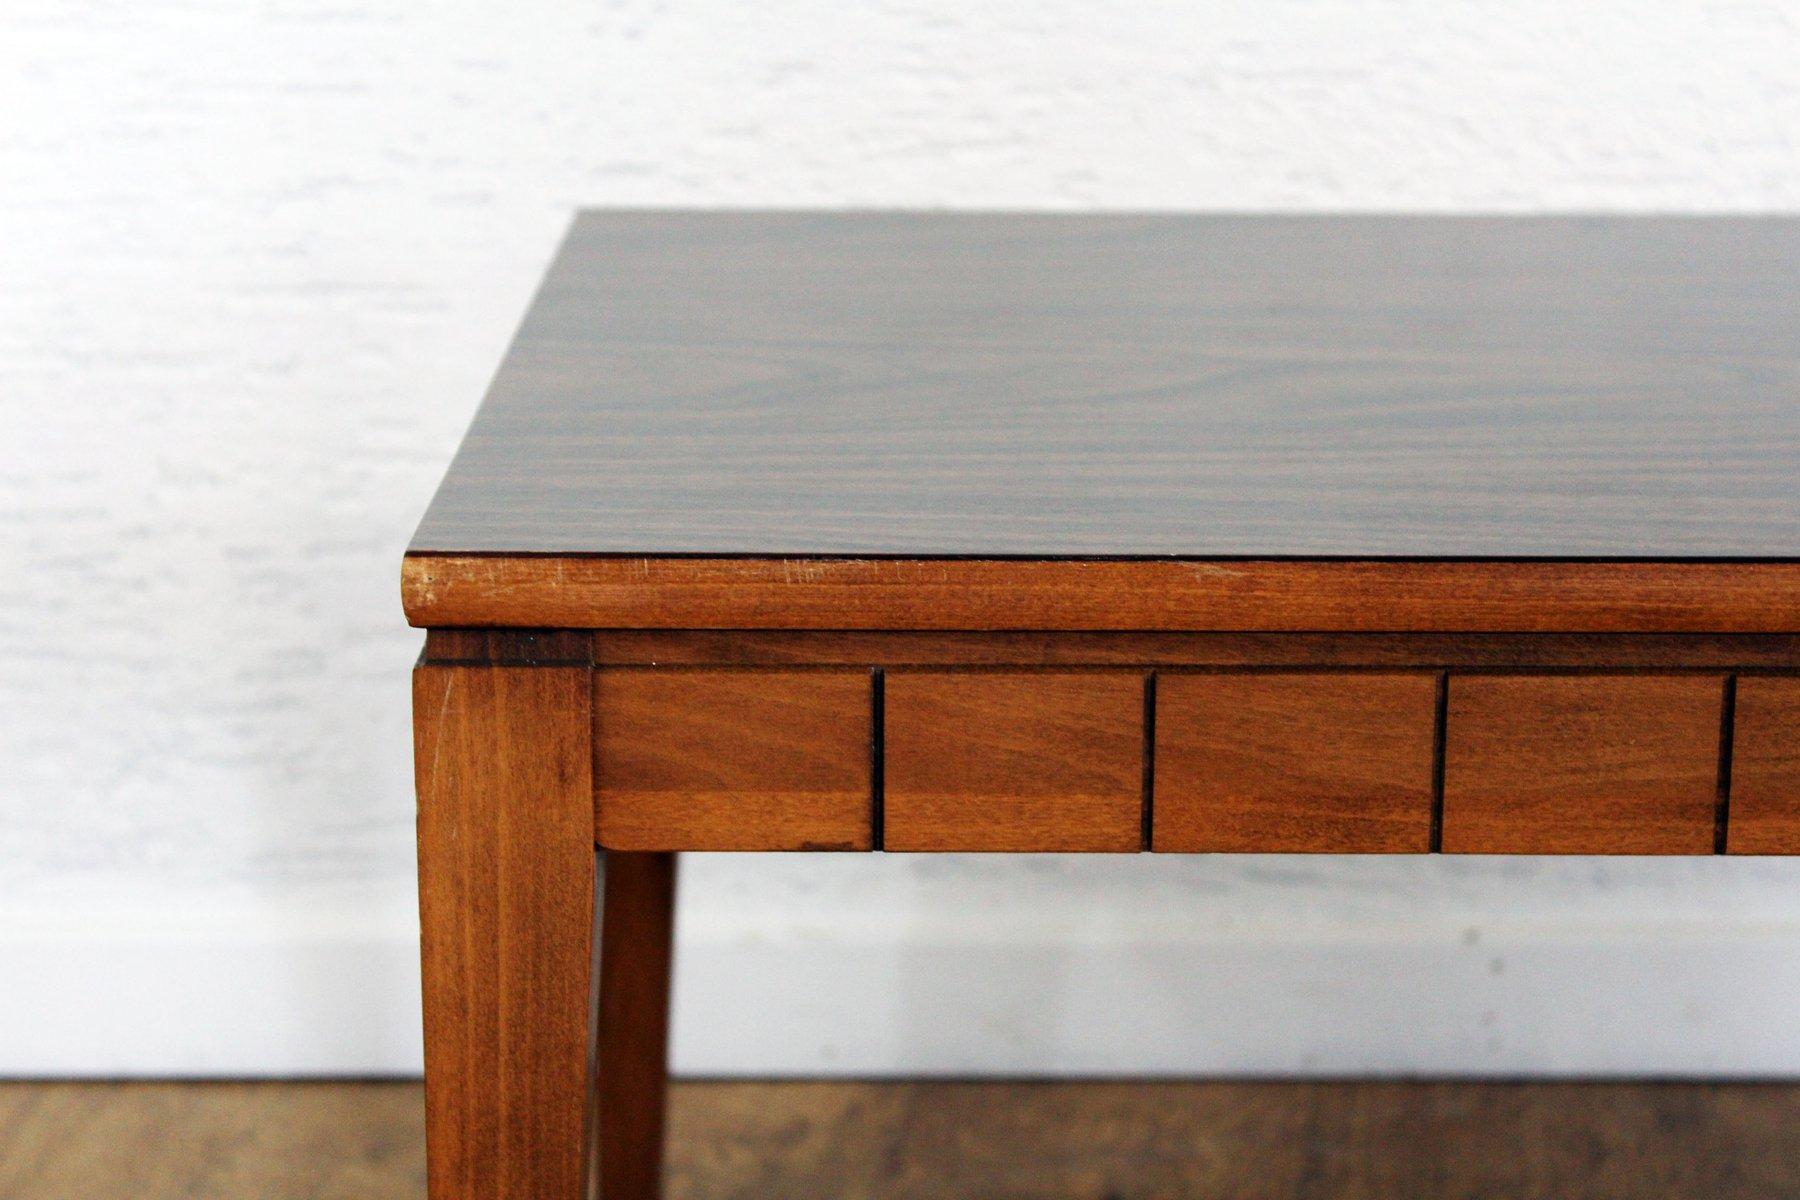 table basse 45 3 vintage scandinave de mersman en vente sur pamono. Black Bedroom Furniture Sets. Home Design Ideas